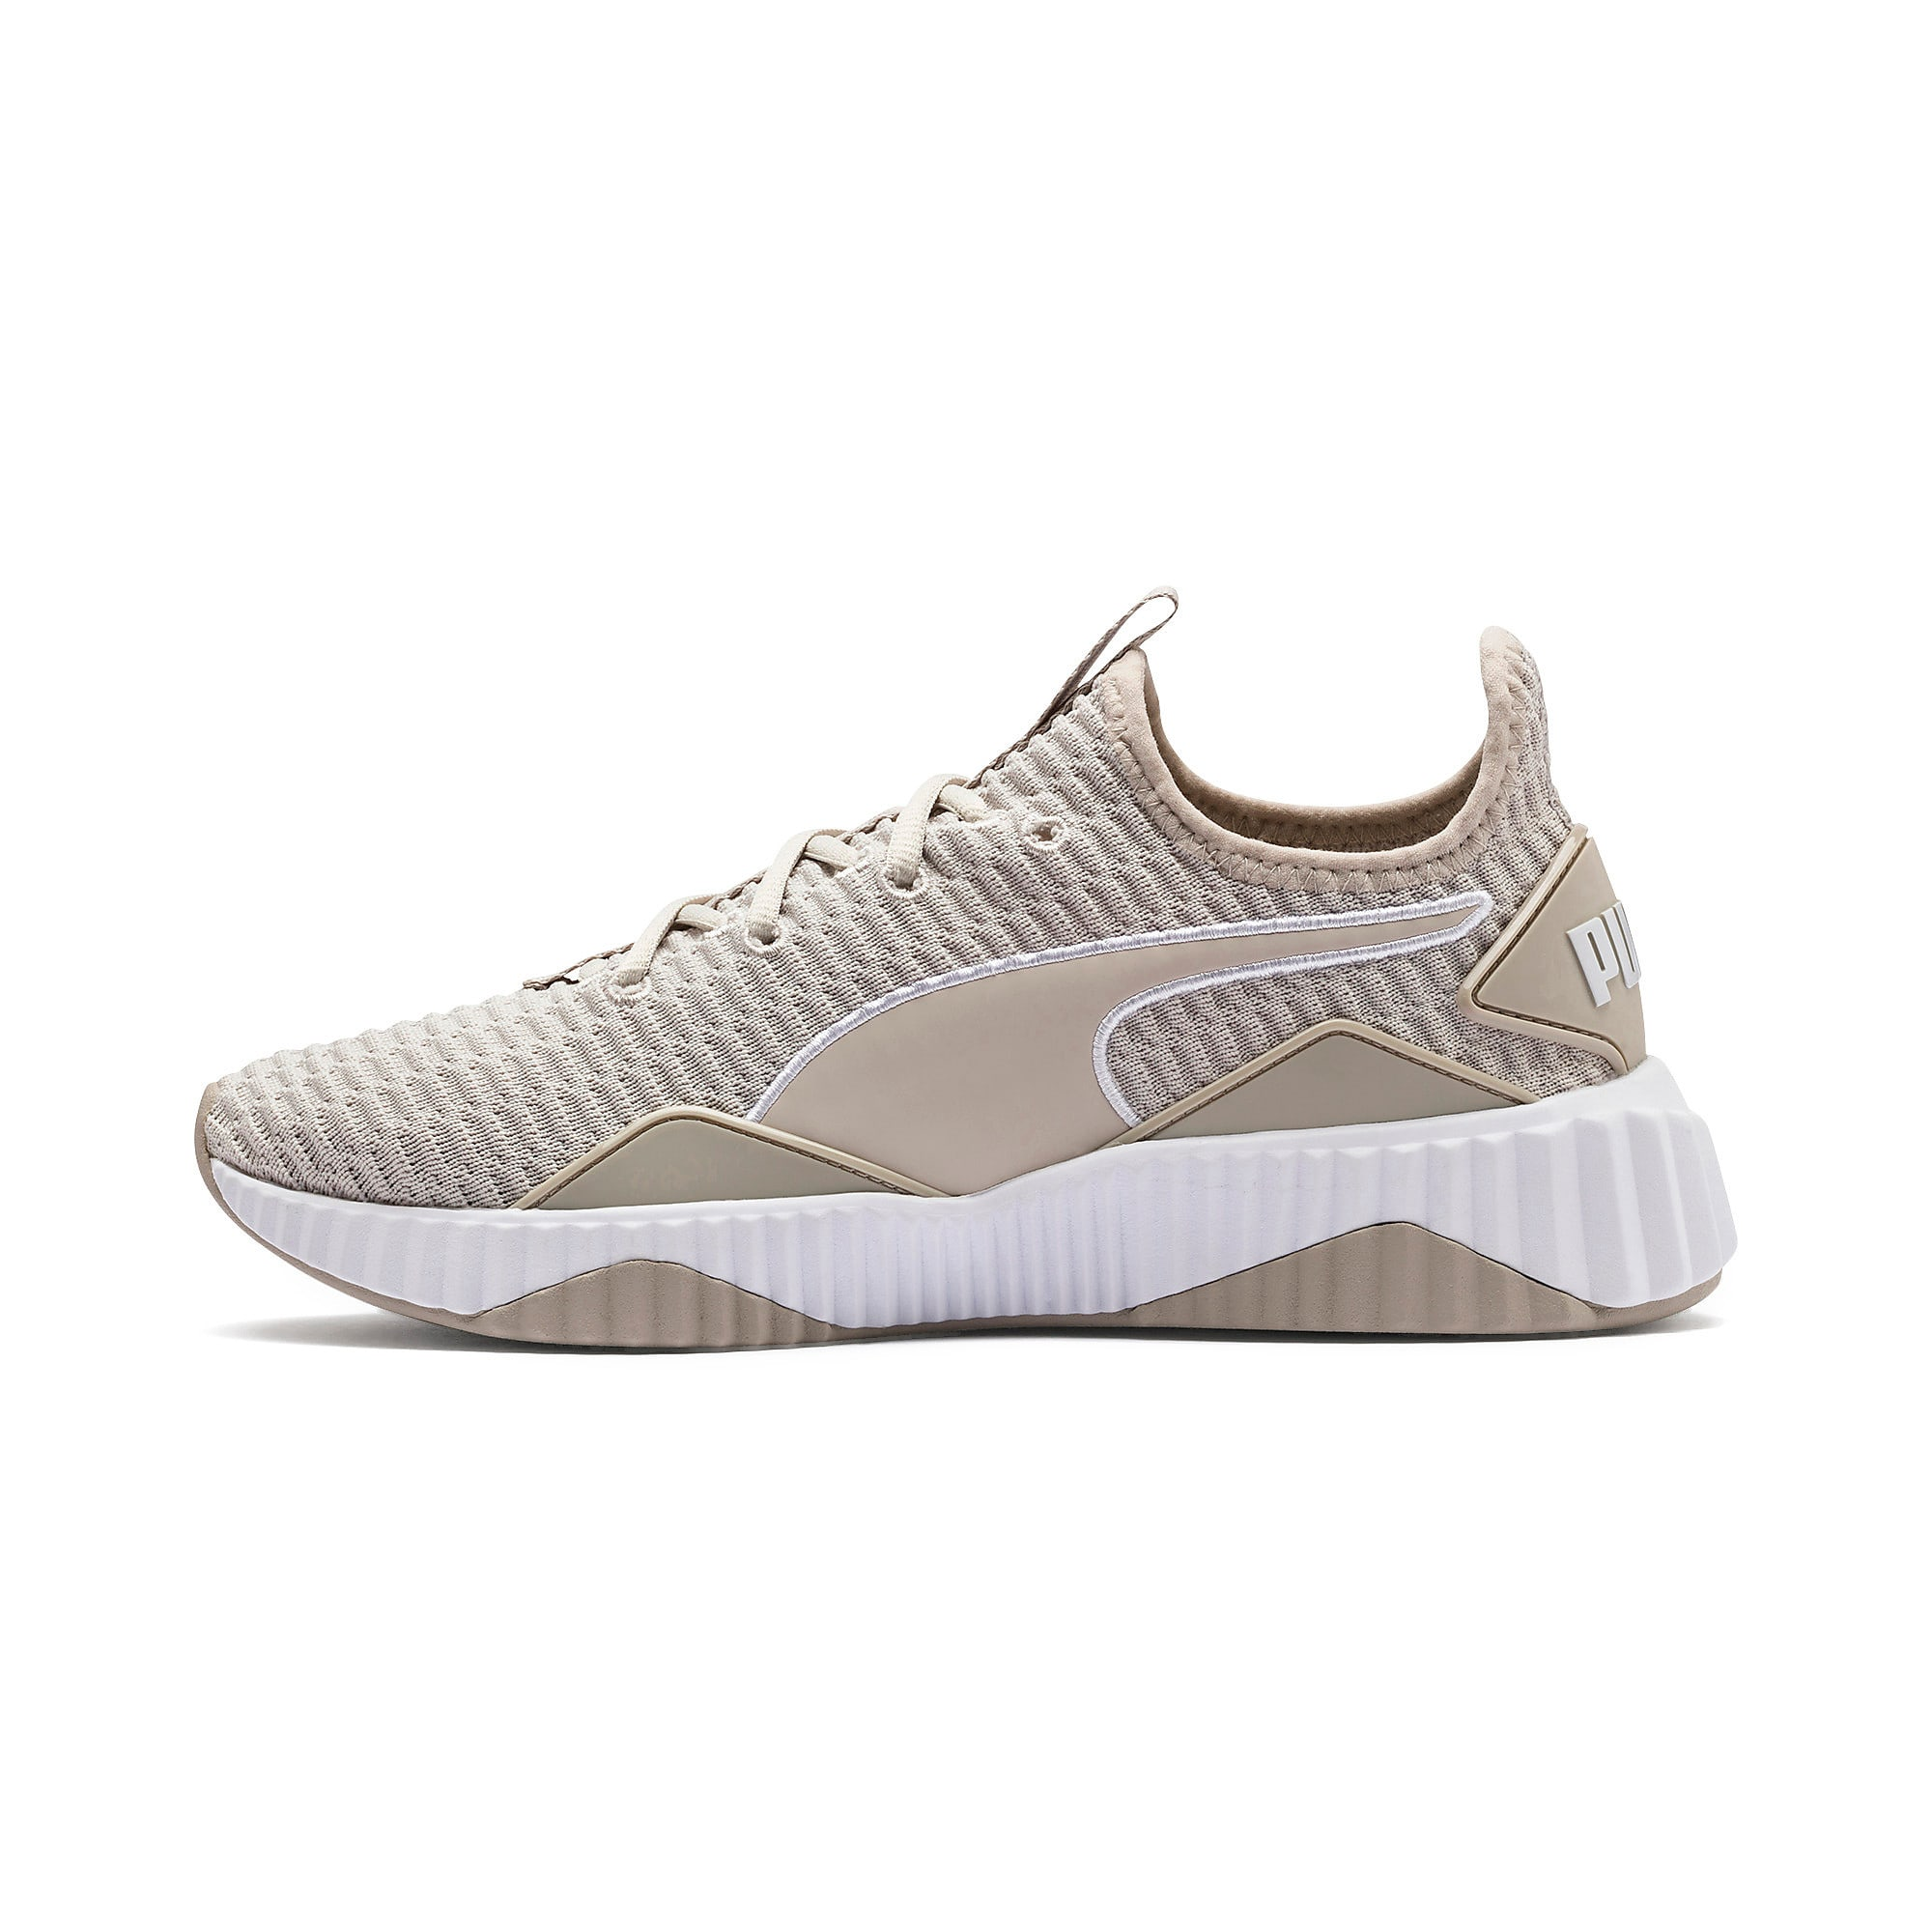 Thumbnail 1 of Defy Women's Training Shoes, Silver Gray-Puma White, medium